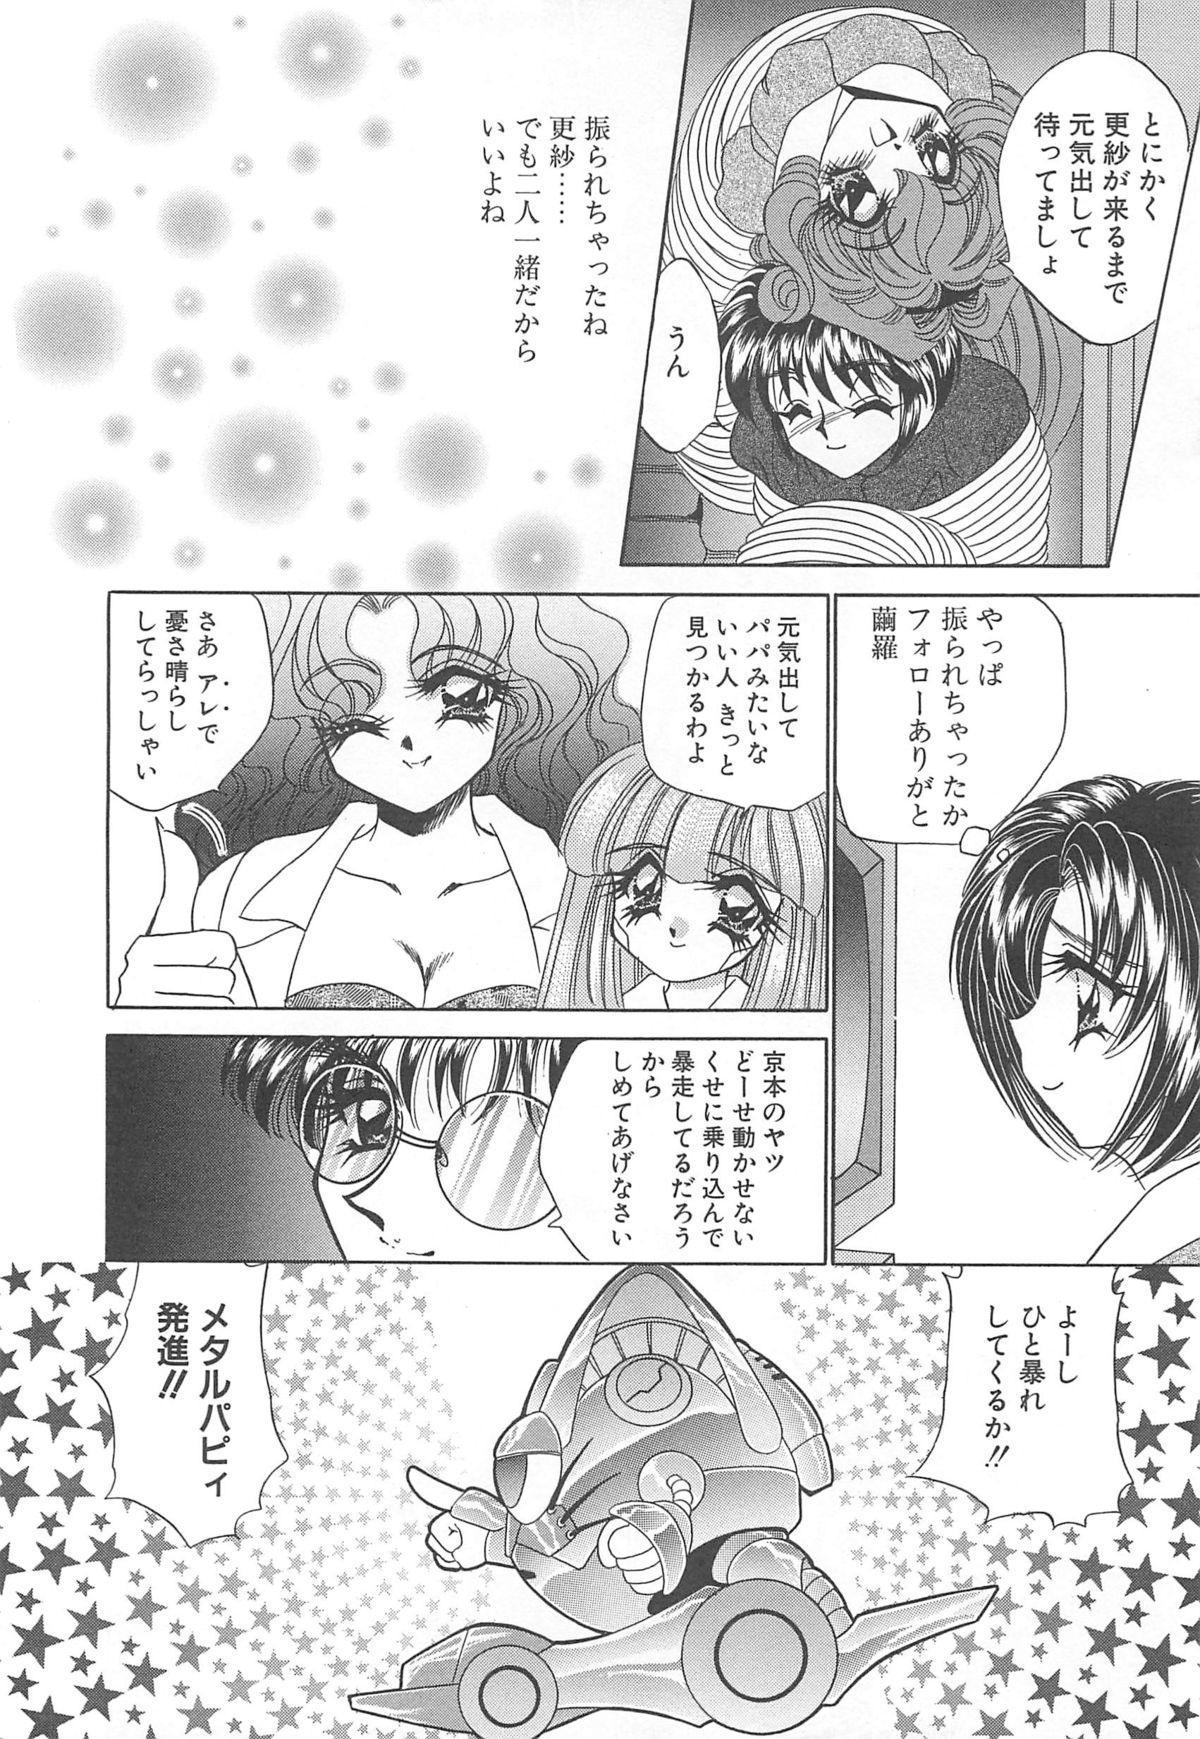 Kigurumi Sentai Quiltian 194